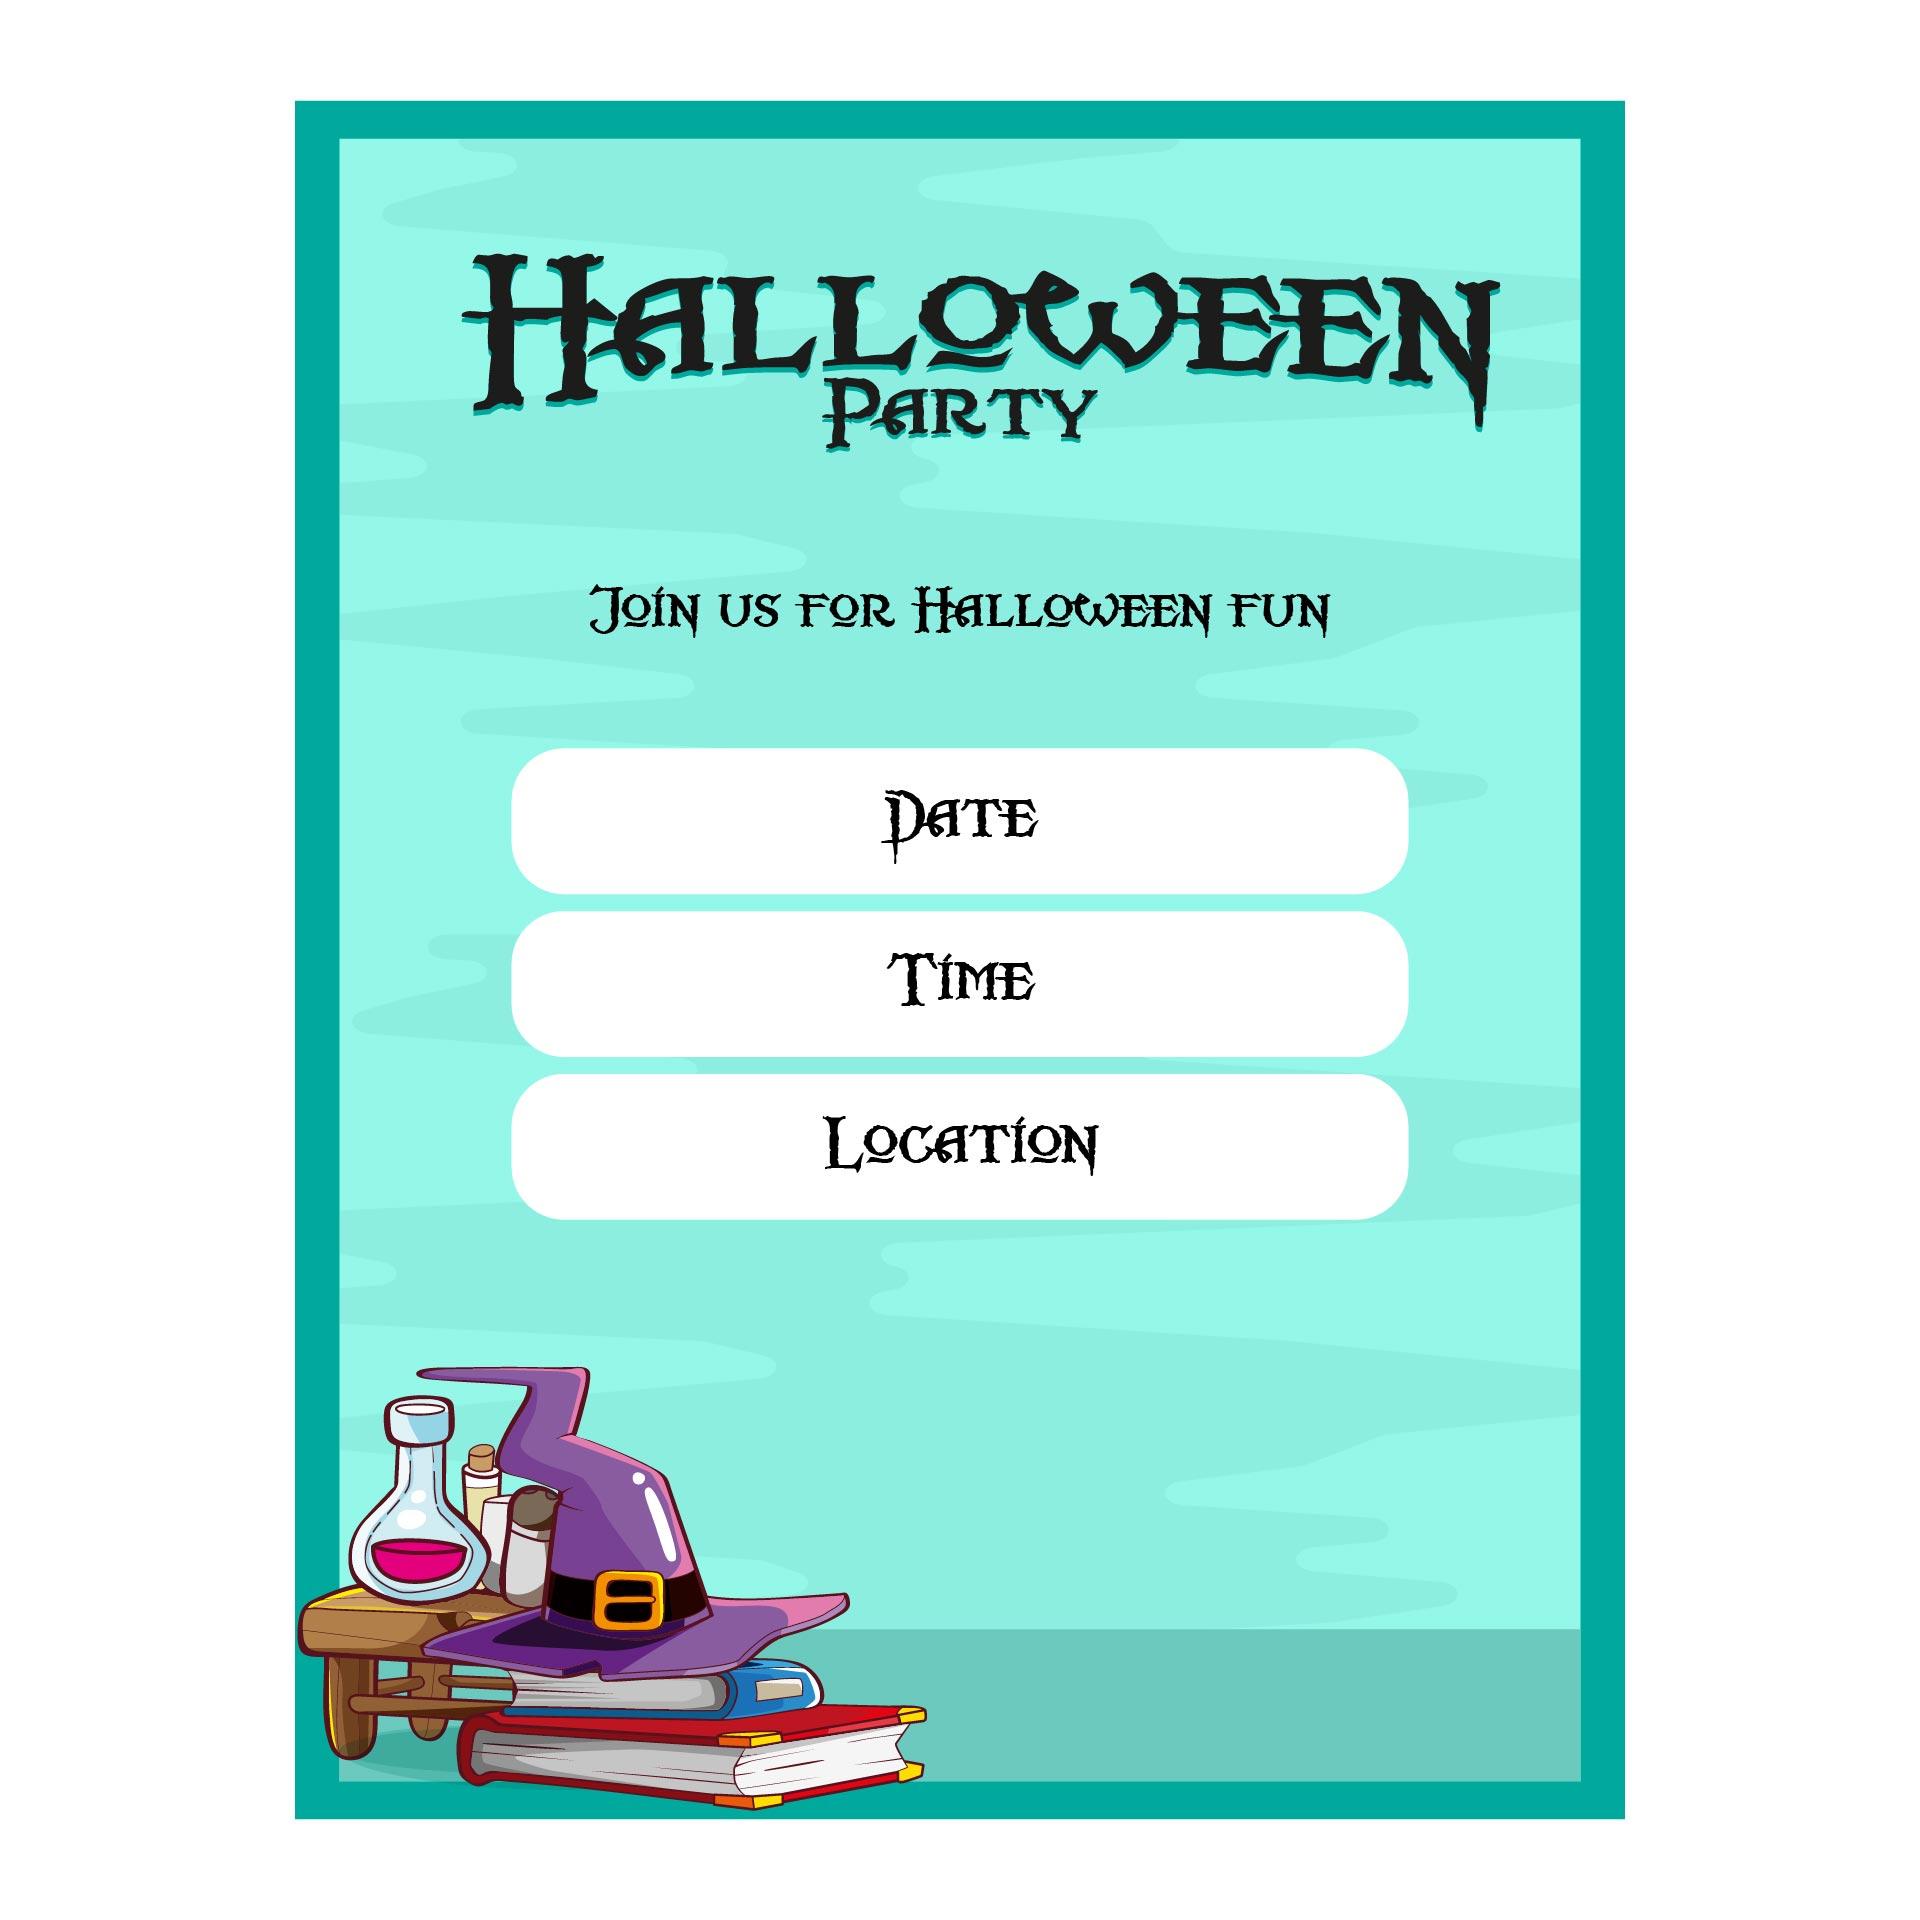 Printable Halloween Costume Party Invitations 33193 – Free Printable Halloween Costume Party Invitations